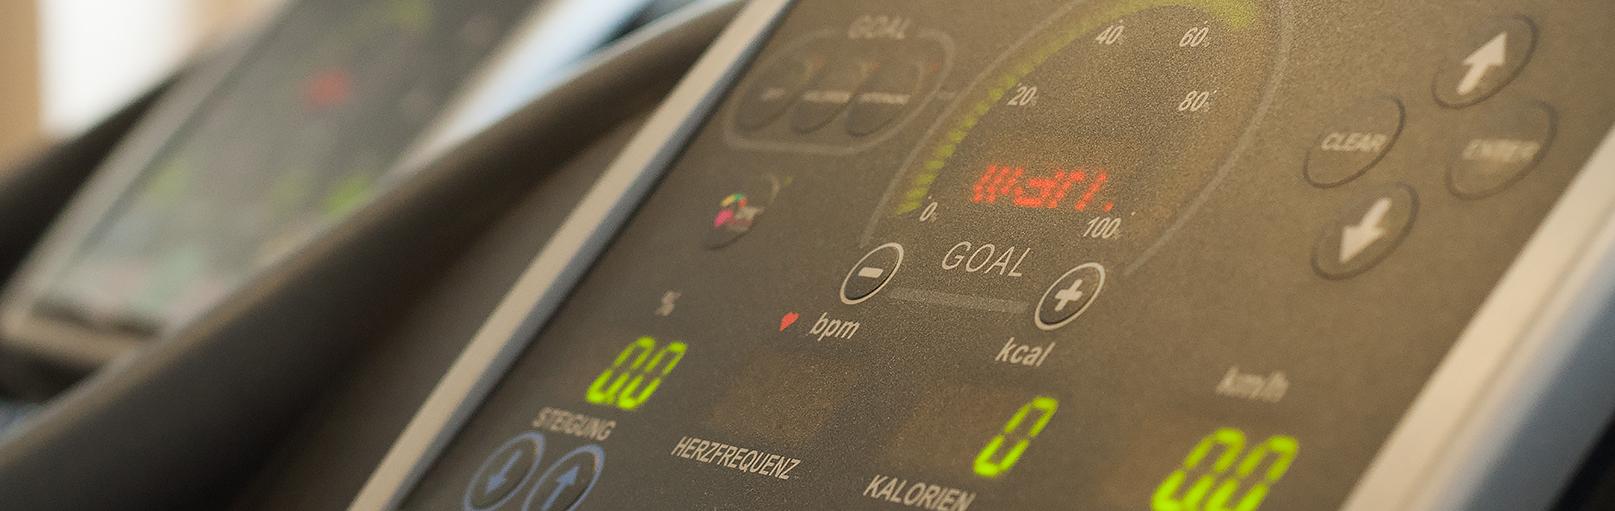 Deen Fitness Club GmbH